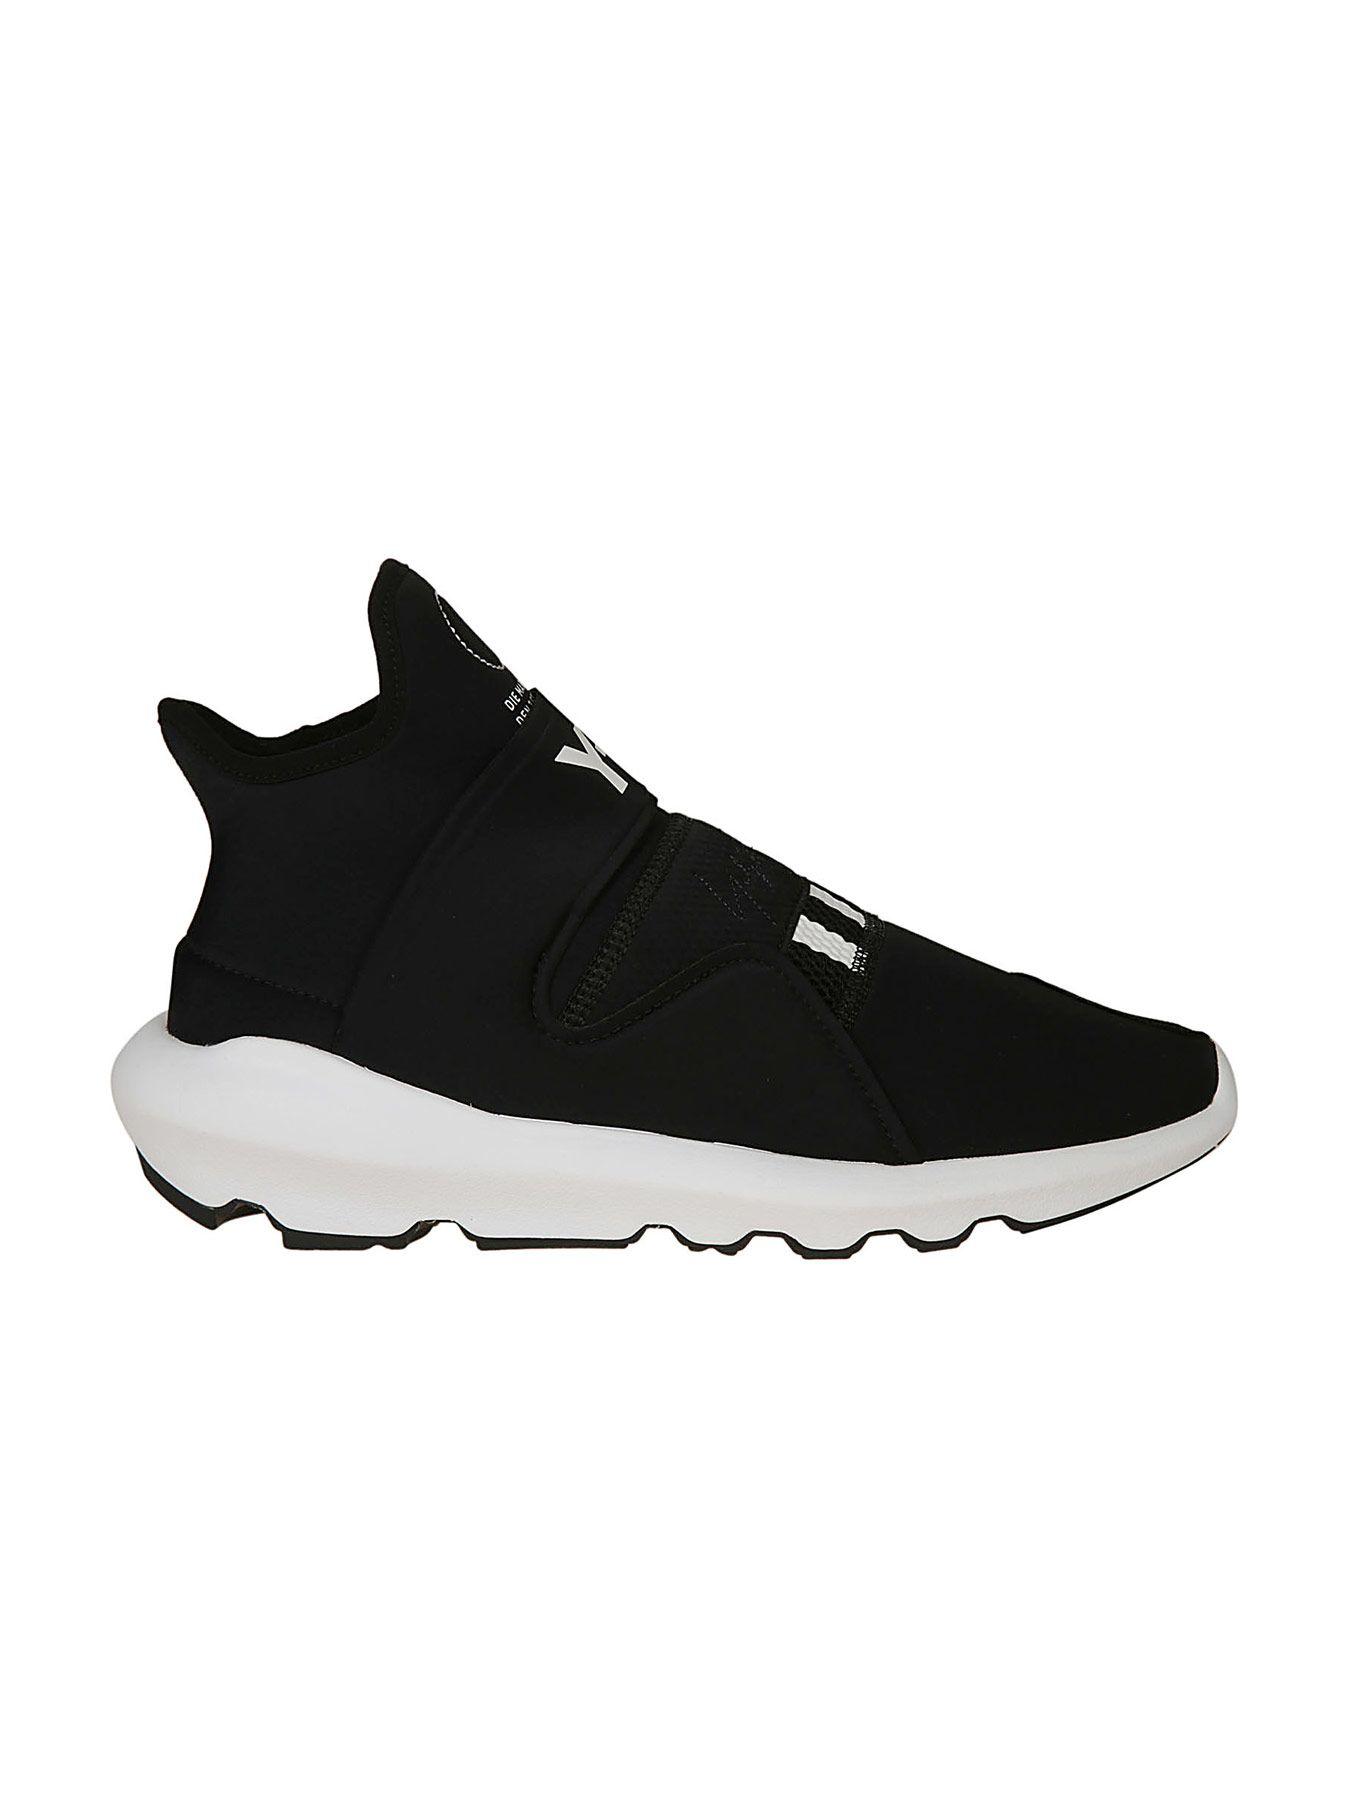 Suberou Slip-on Sneakers